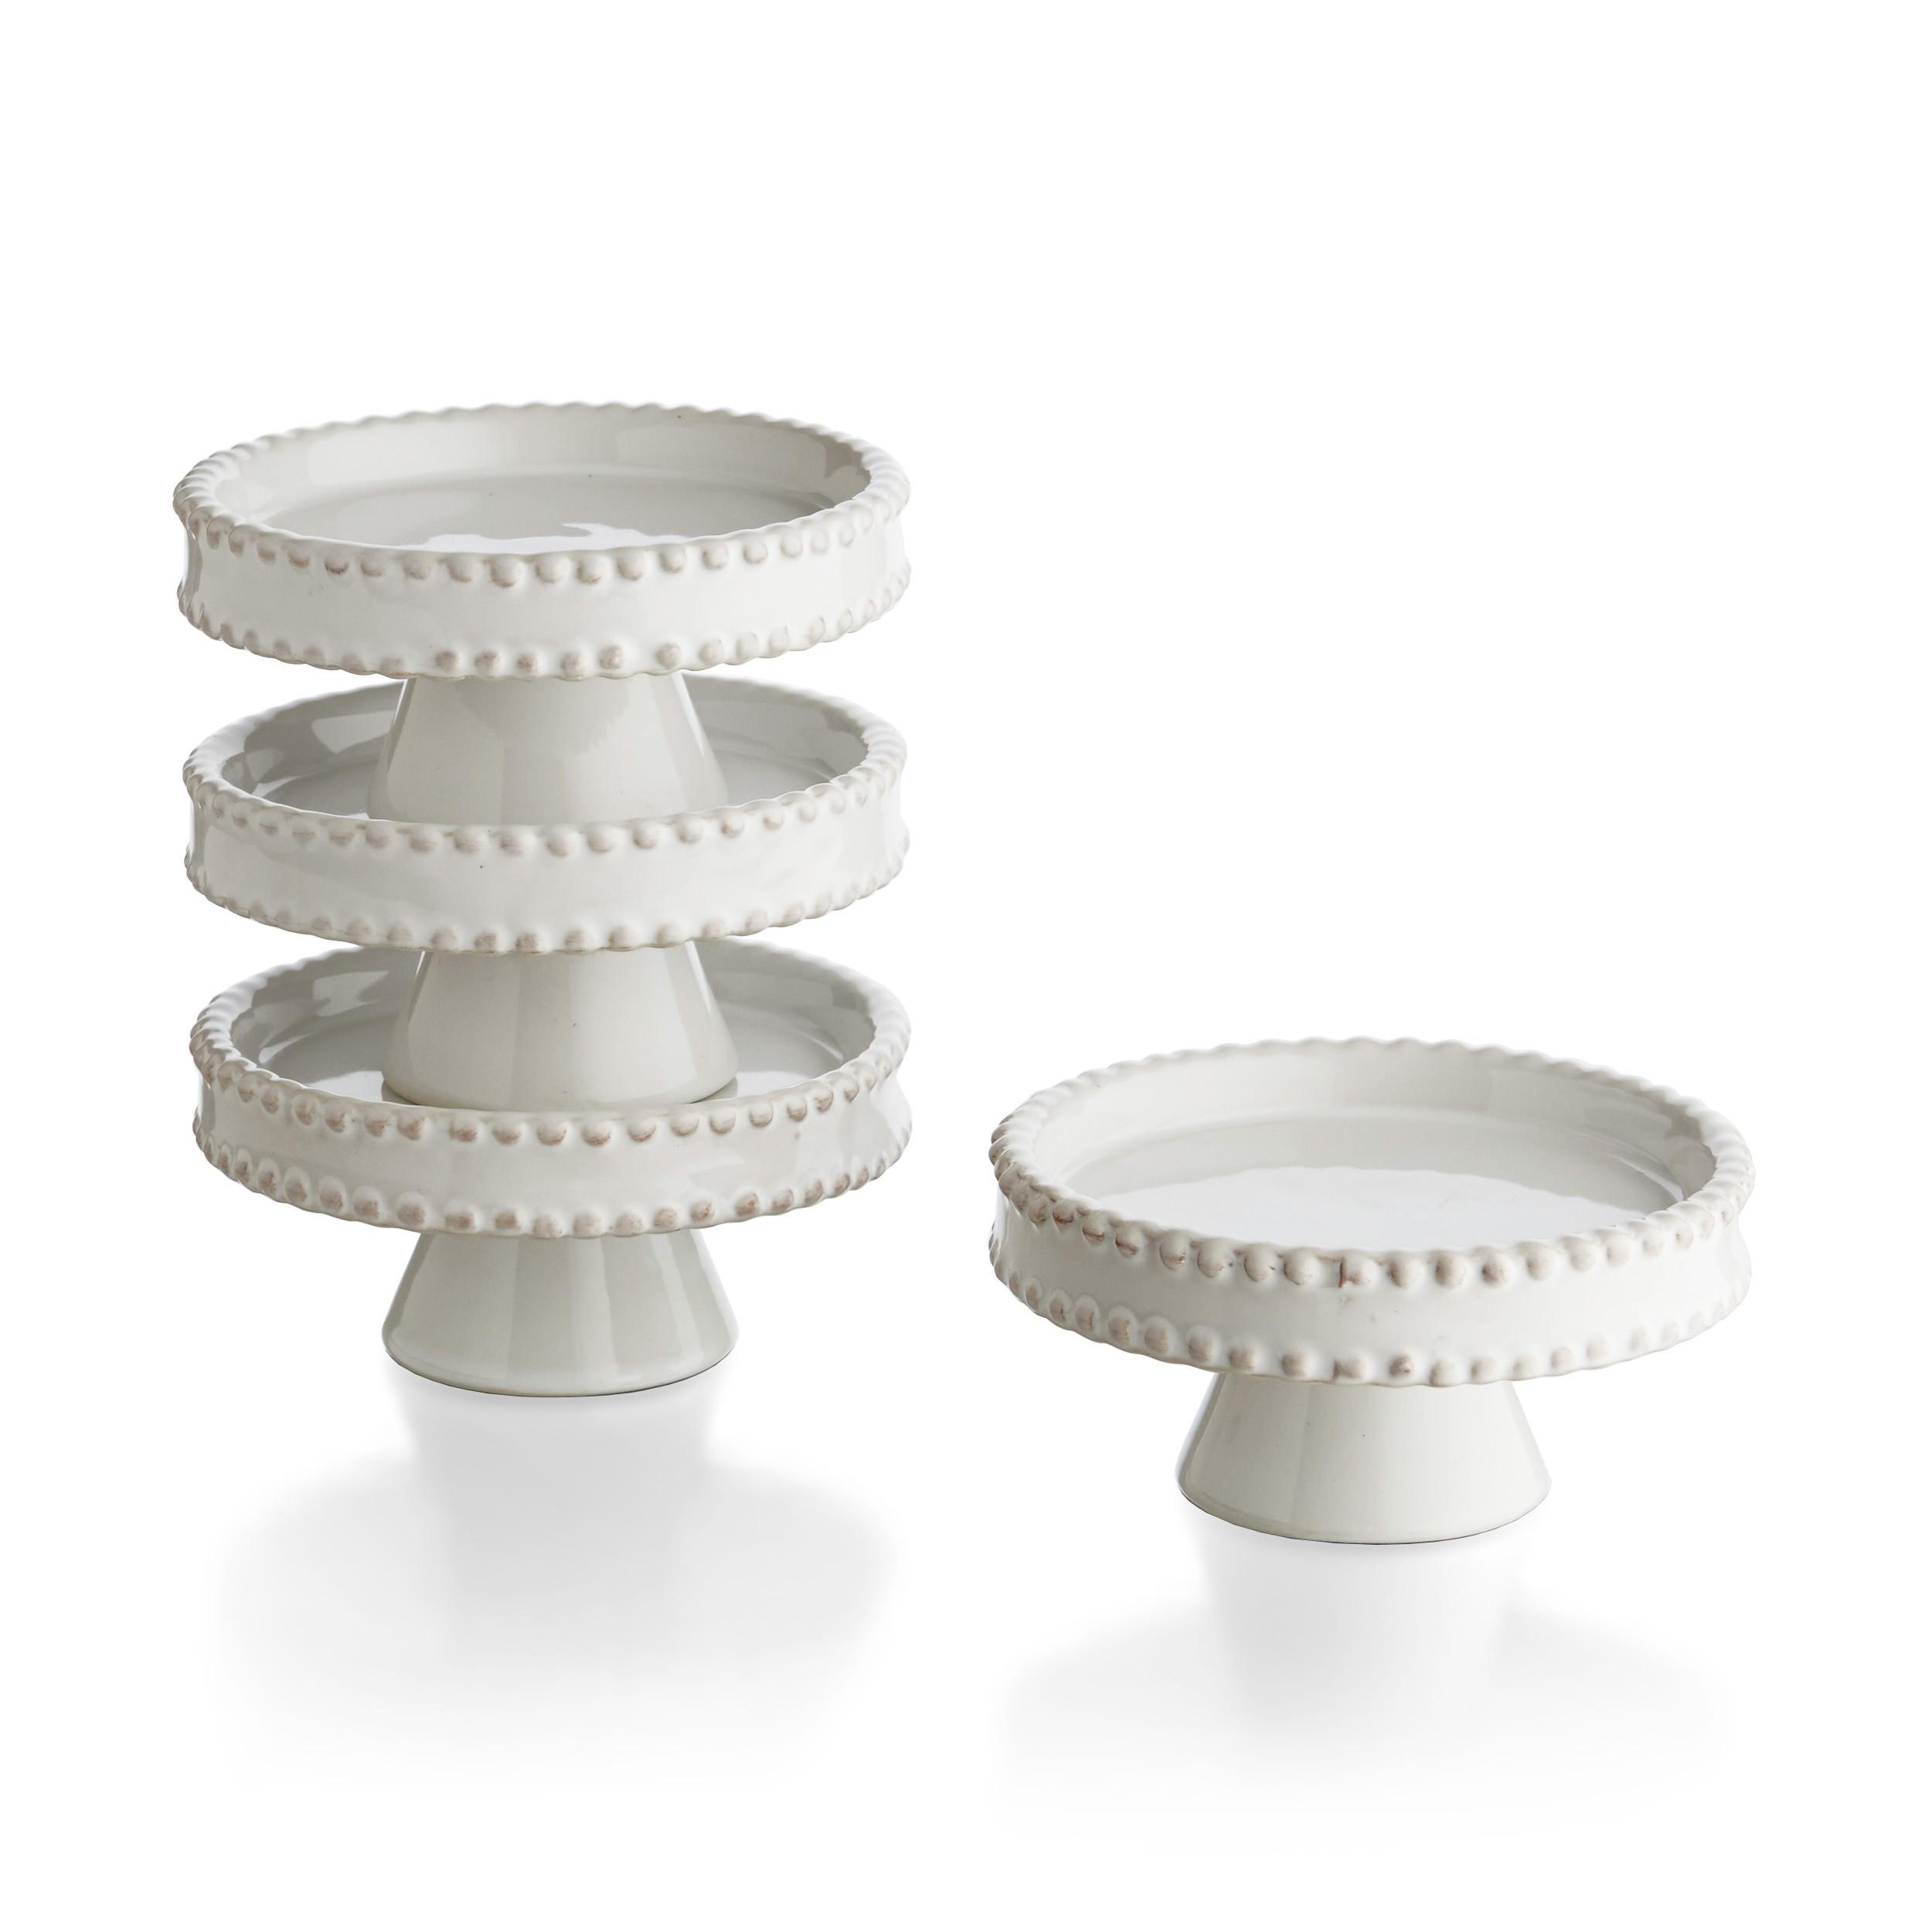 American Atelier Bianca Bead Cupcake Pedestal Plates, Set of 4